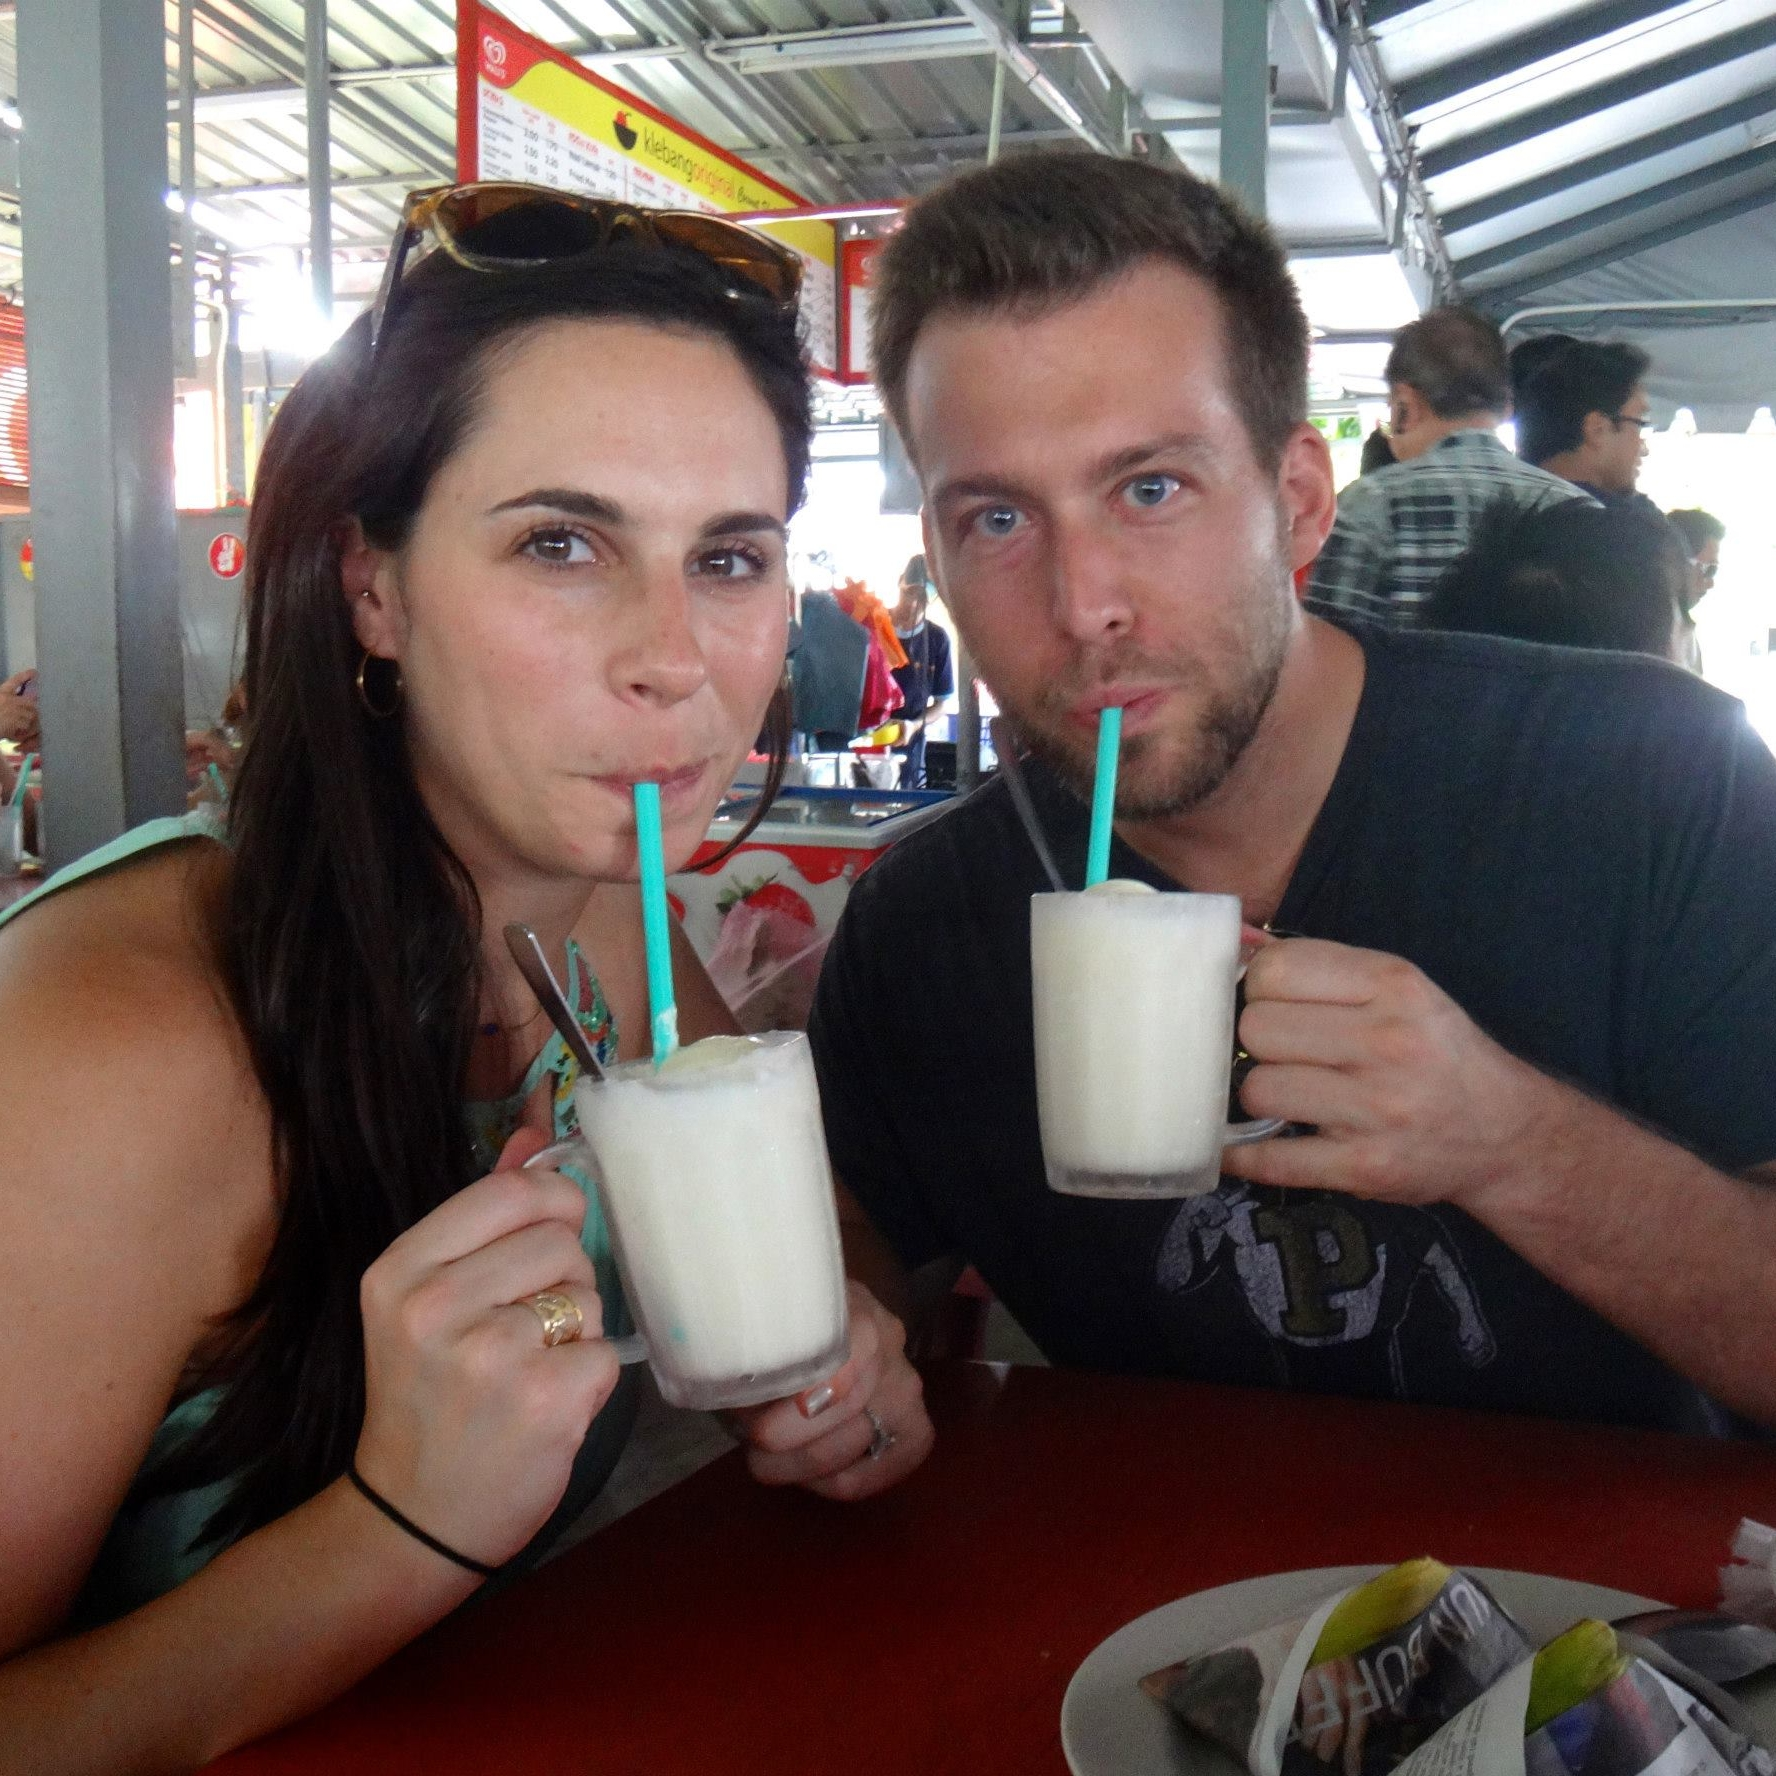 malaysia-klebang-coconut-shake eating abroad expat